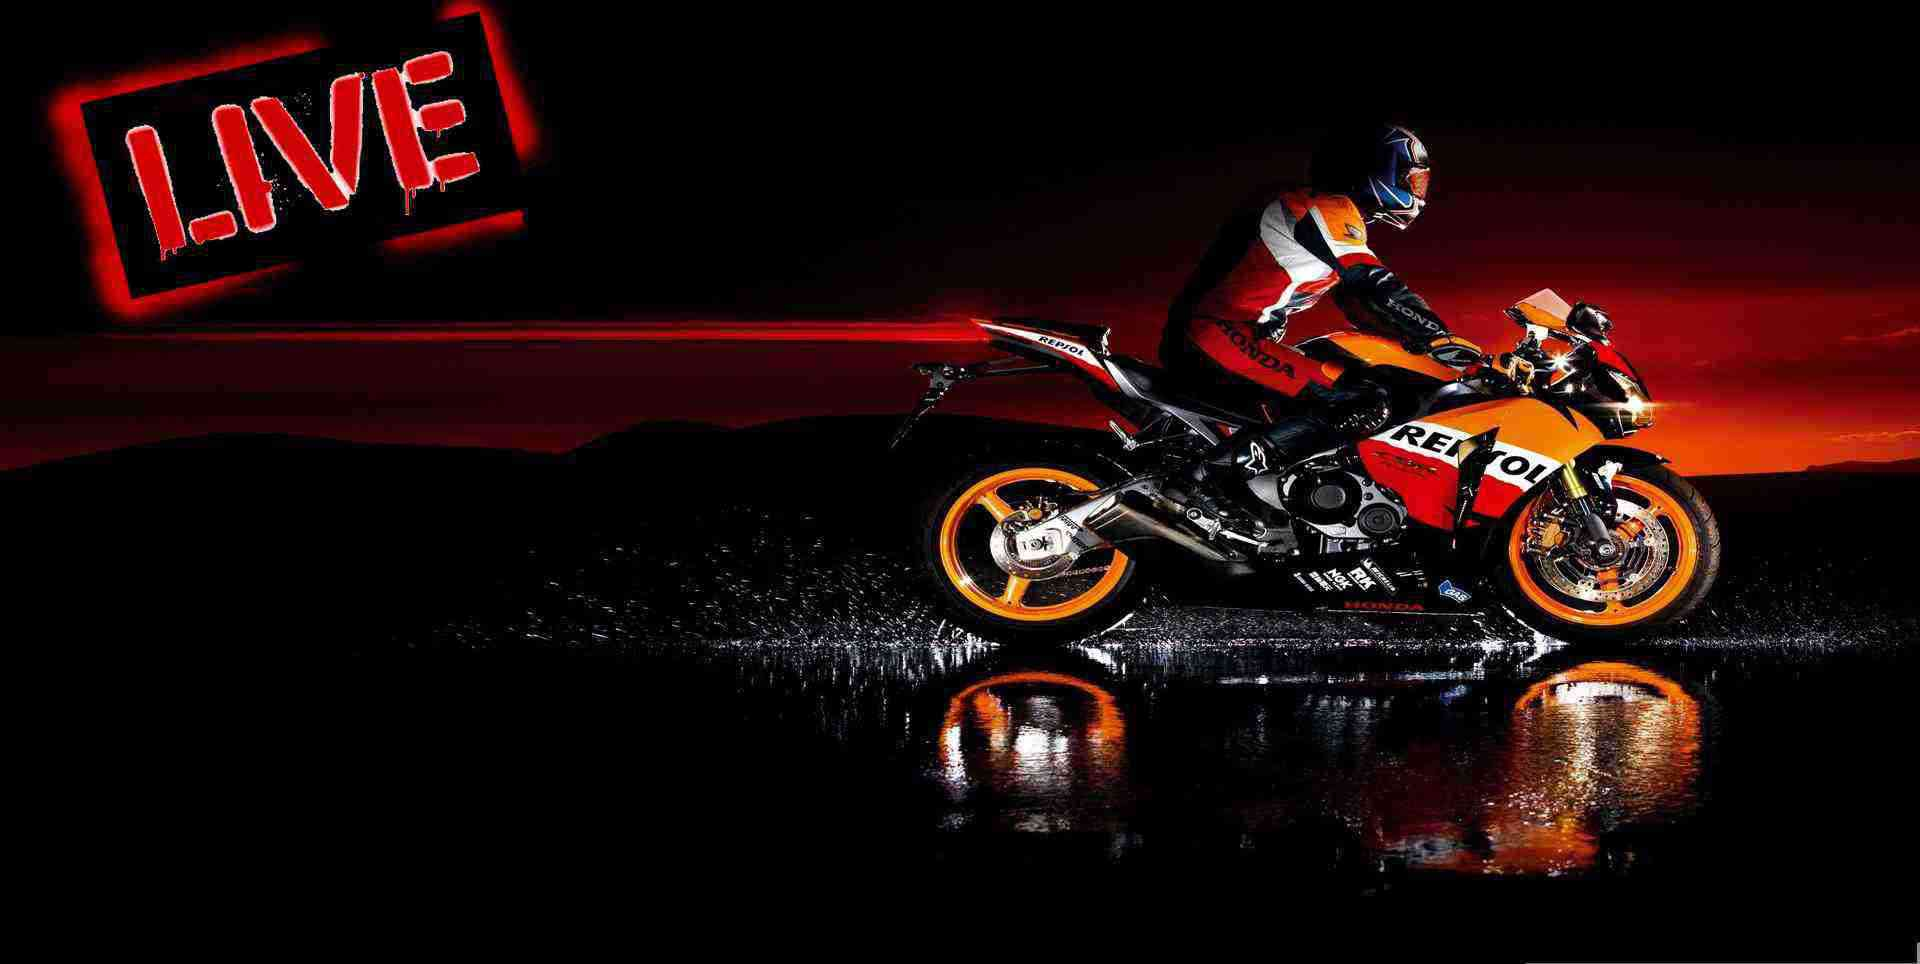 2018 Qatar motorcycle Grand Prix Live Stream